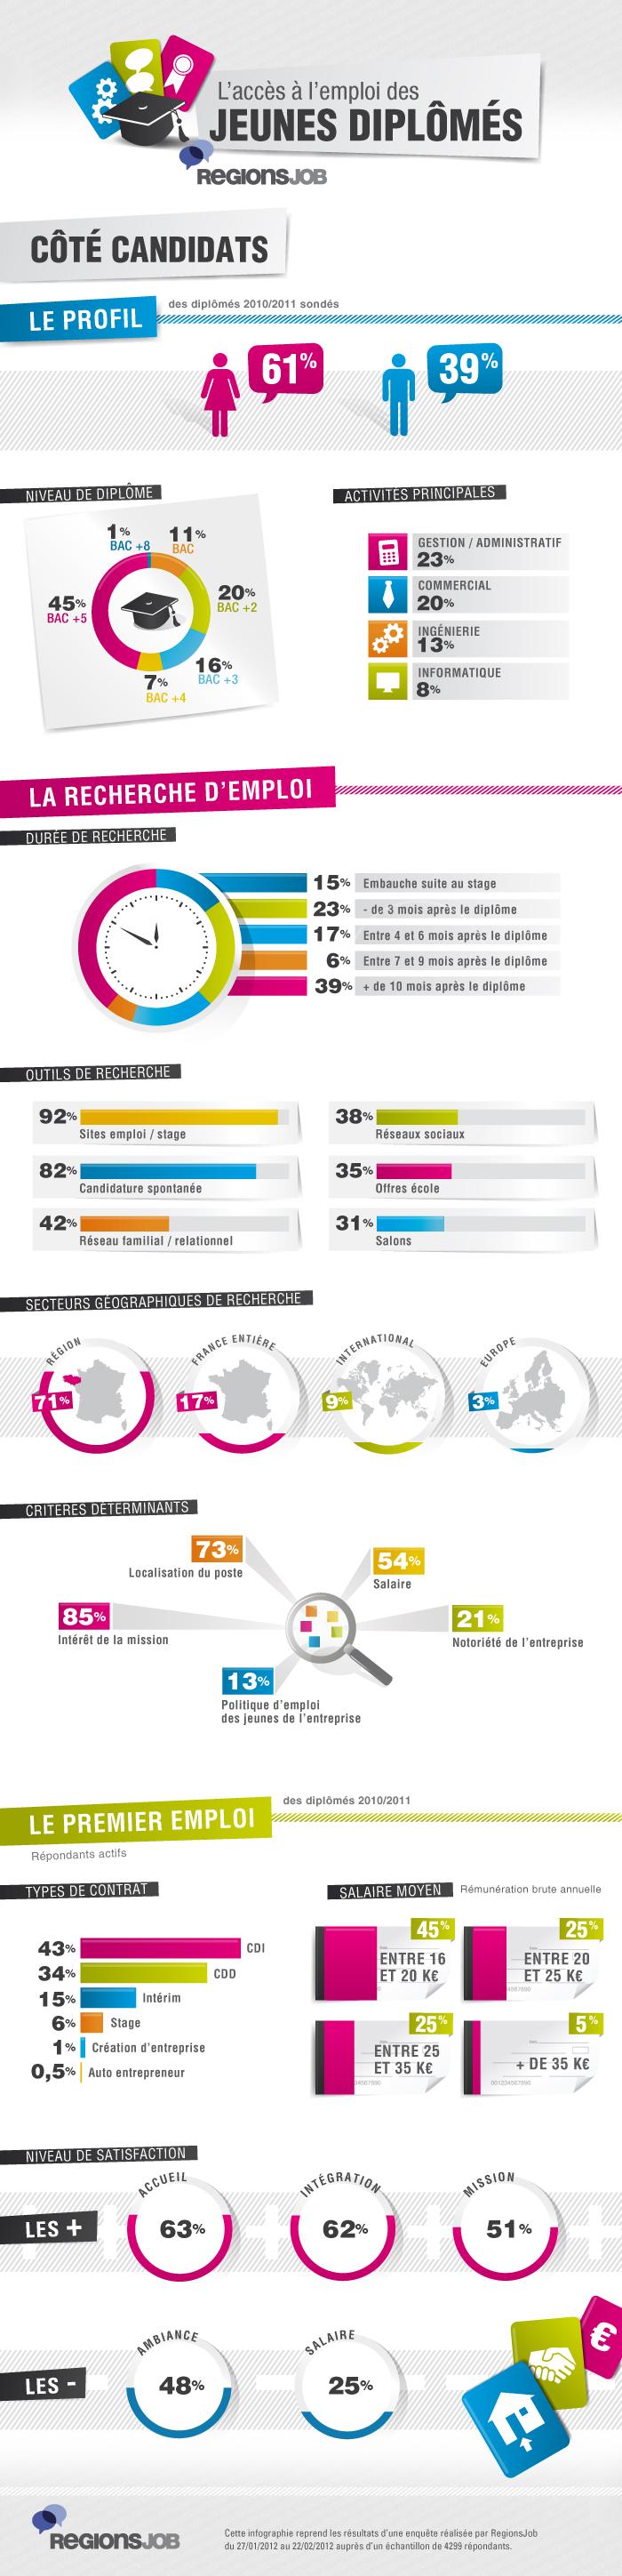 Infographie-Jeunes_diplomes